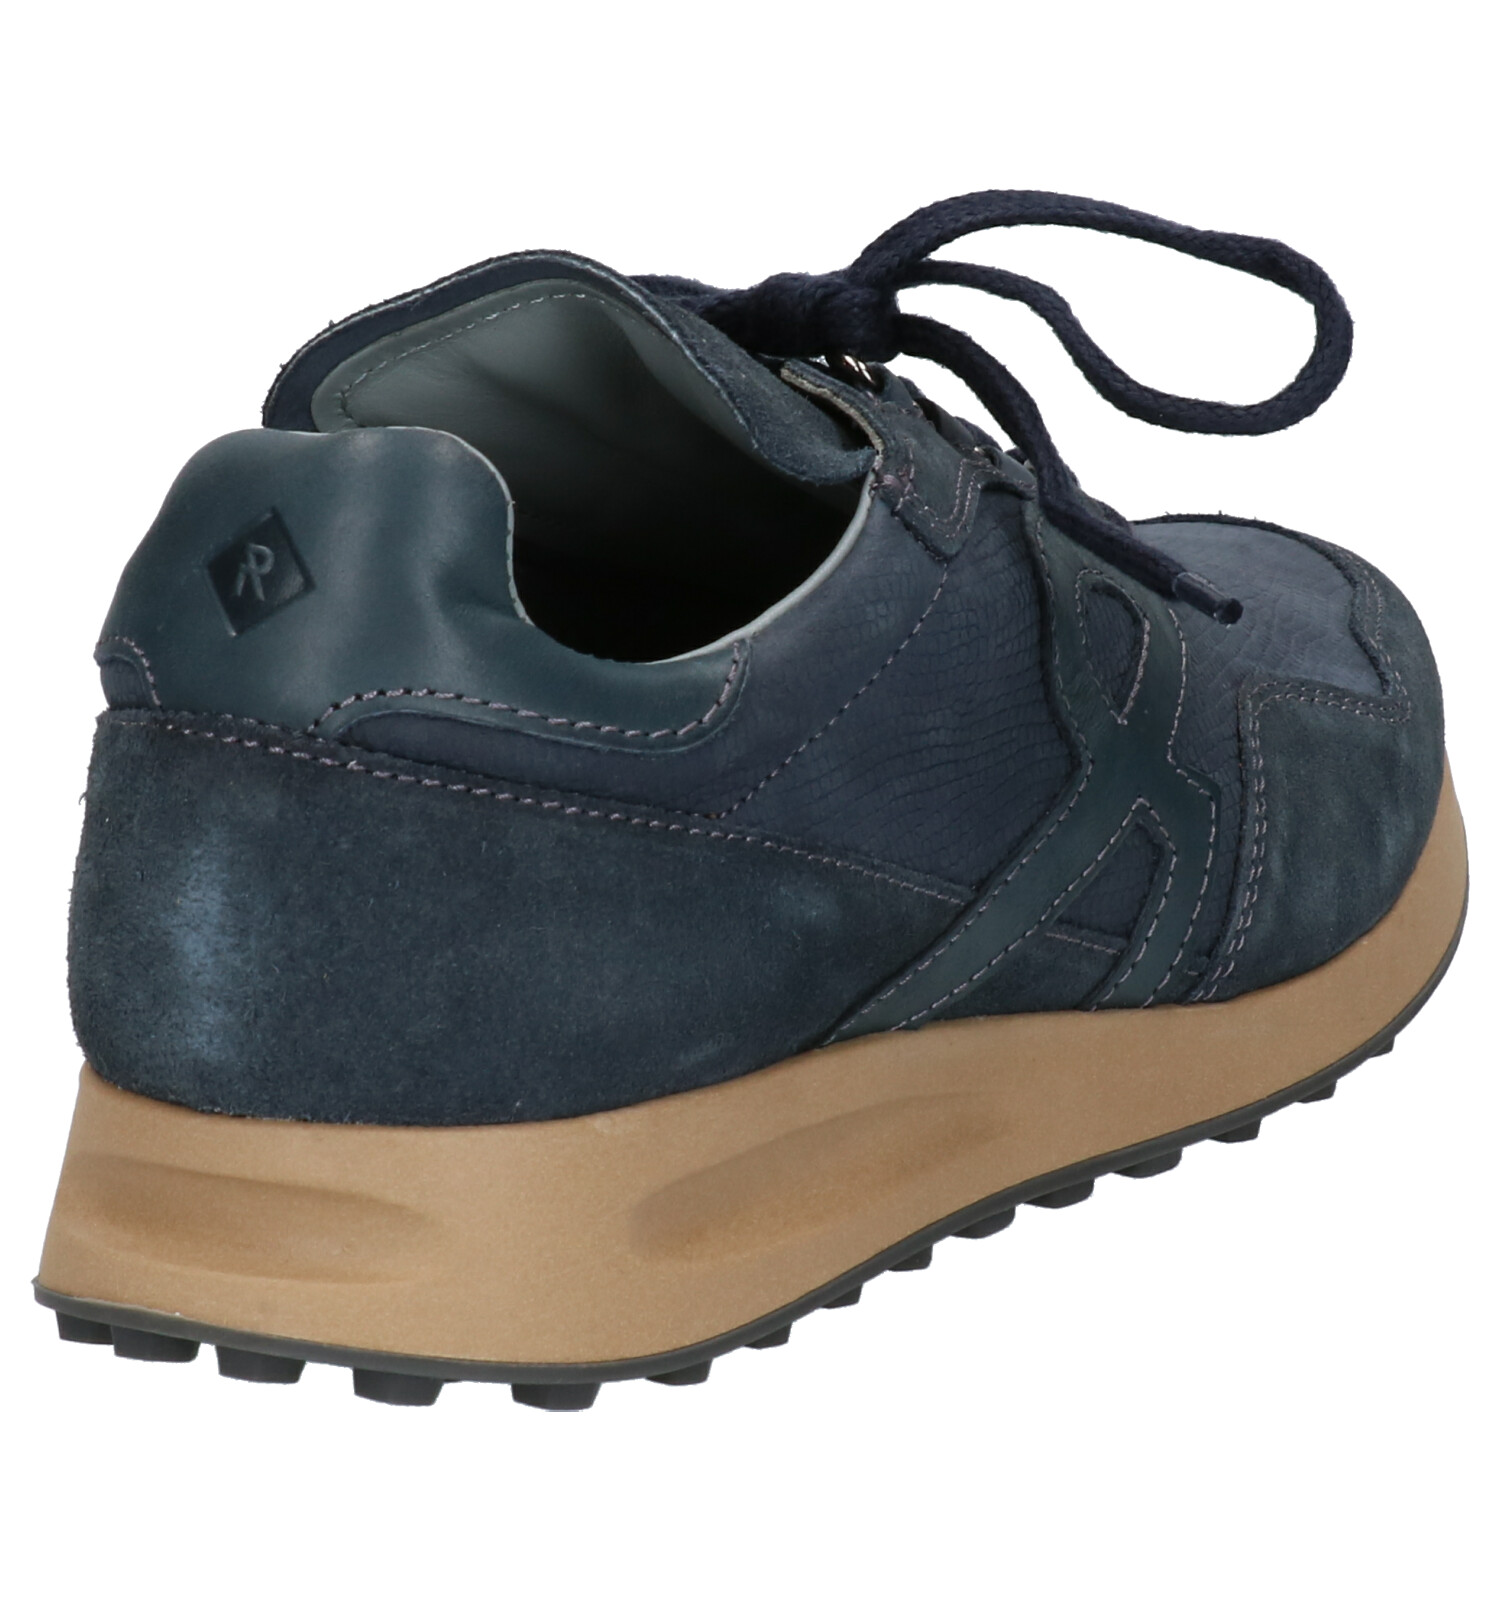 Jagger Blauwe Blauwe Jagger Revolte Revolte Sneakers O80nwXPk